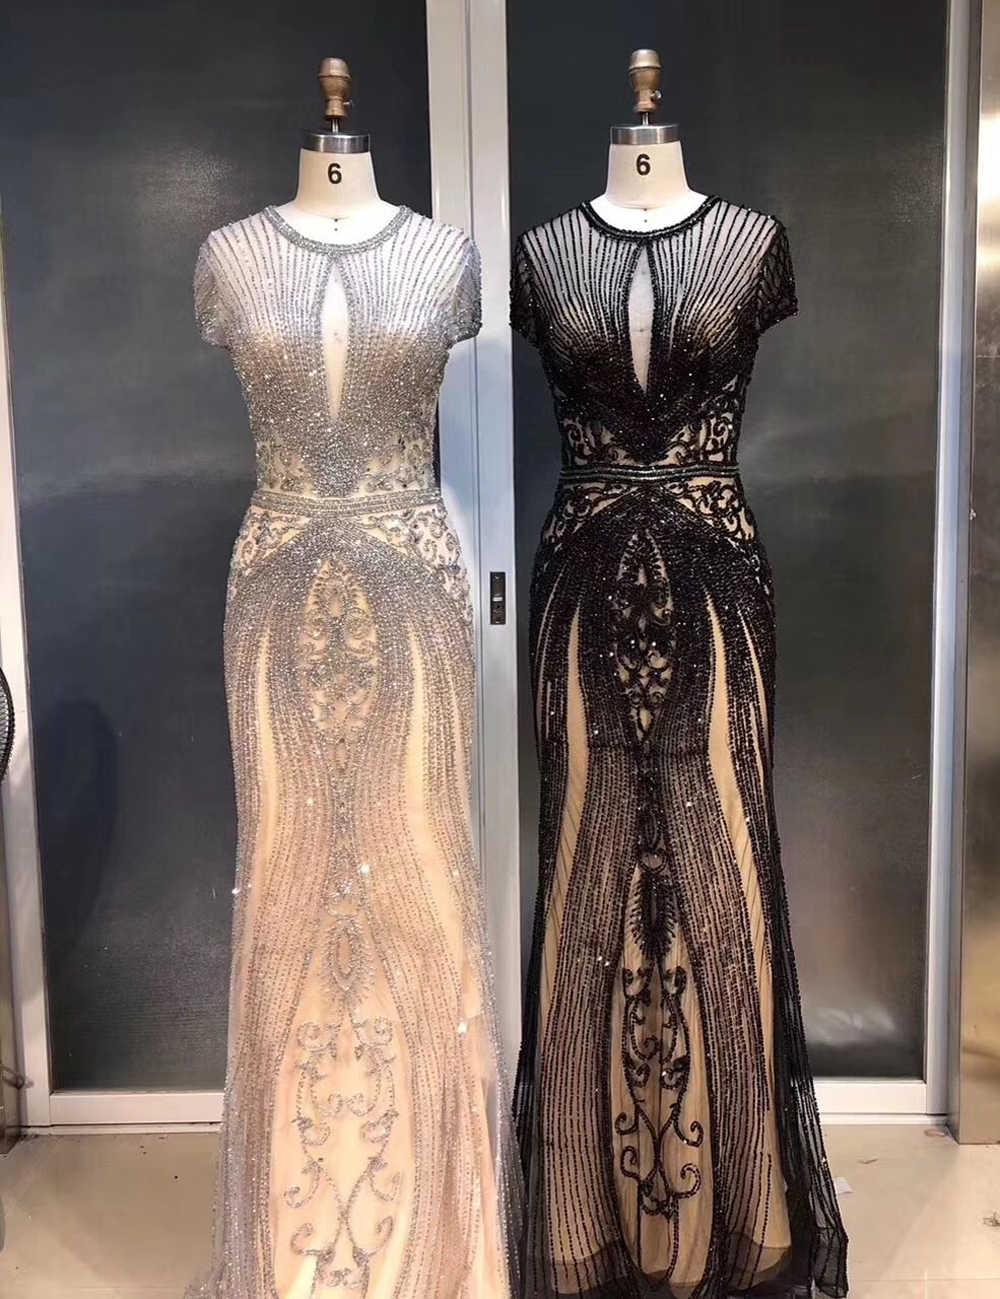 8 neue Ankunft Frauen Abendkleid Kristall Pailletten Perlen Lange O  Ausschnitt Cap Sleeve Party Kleid